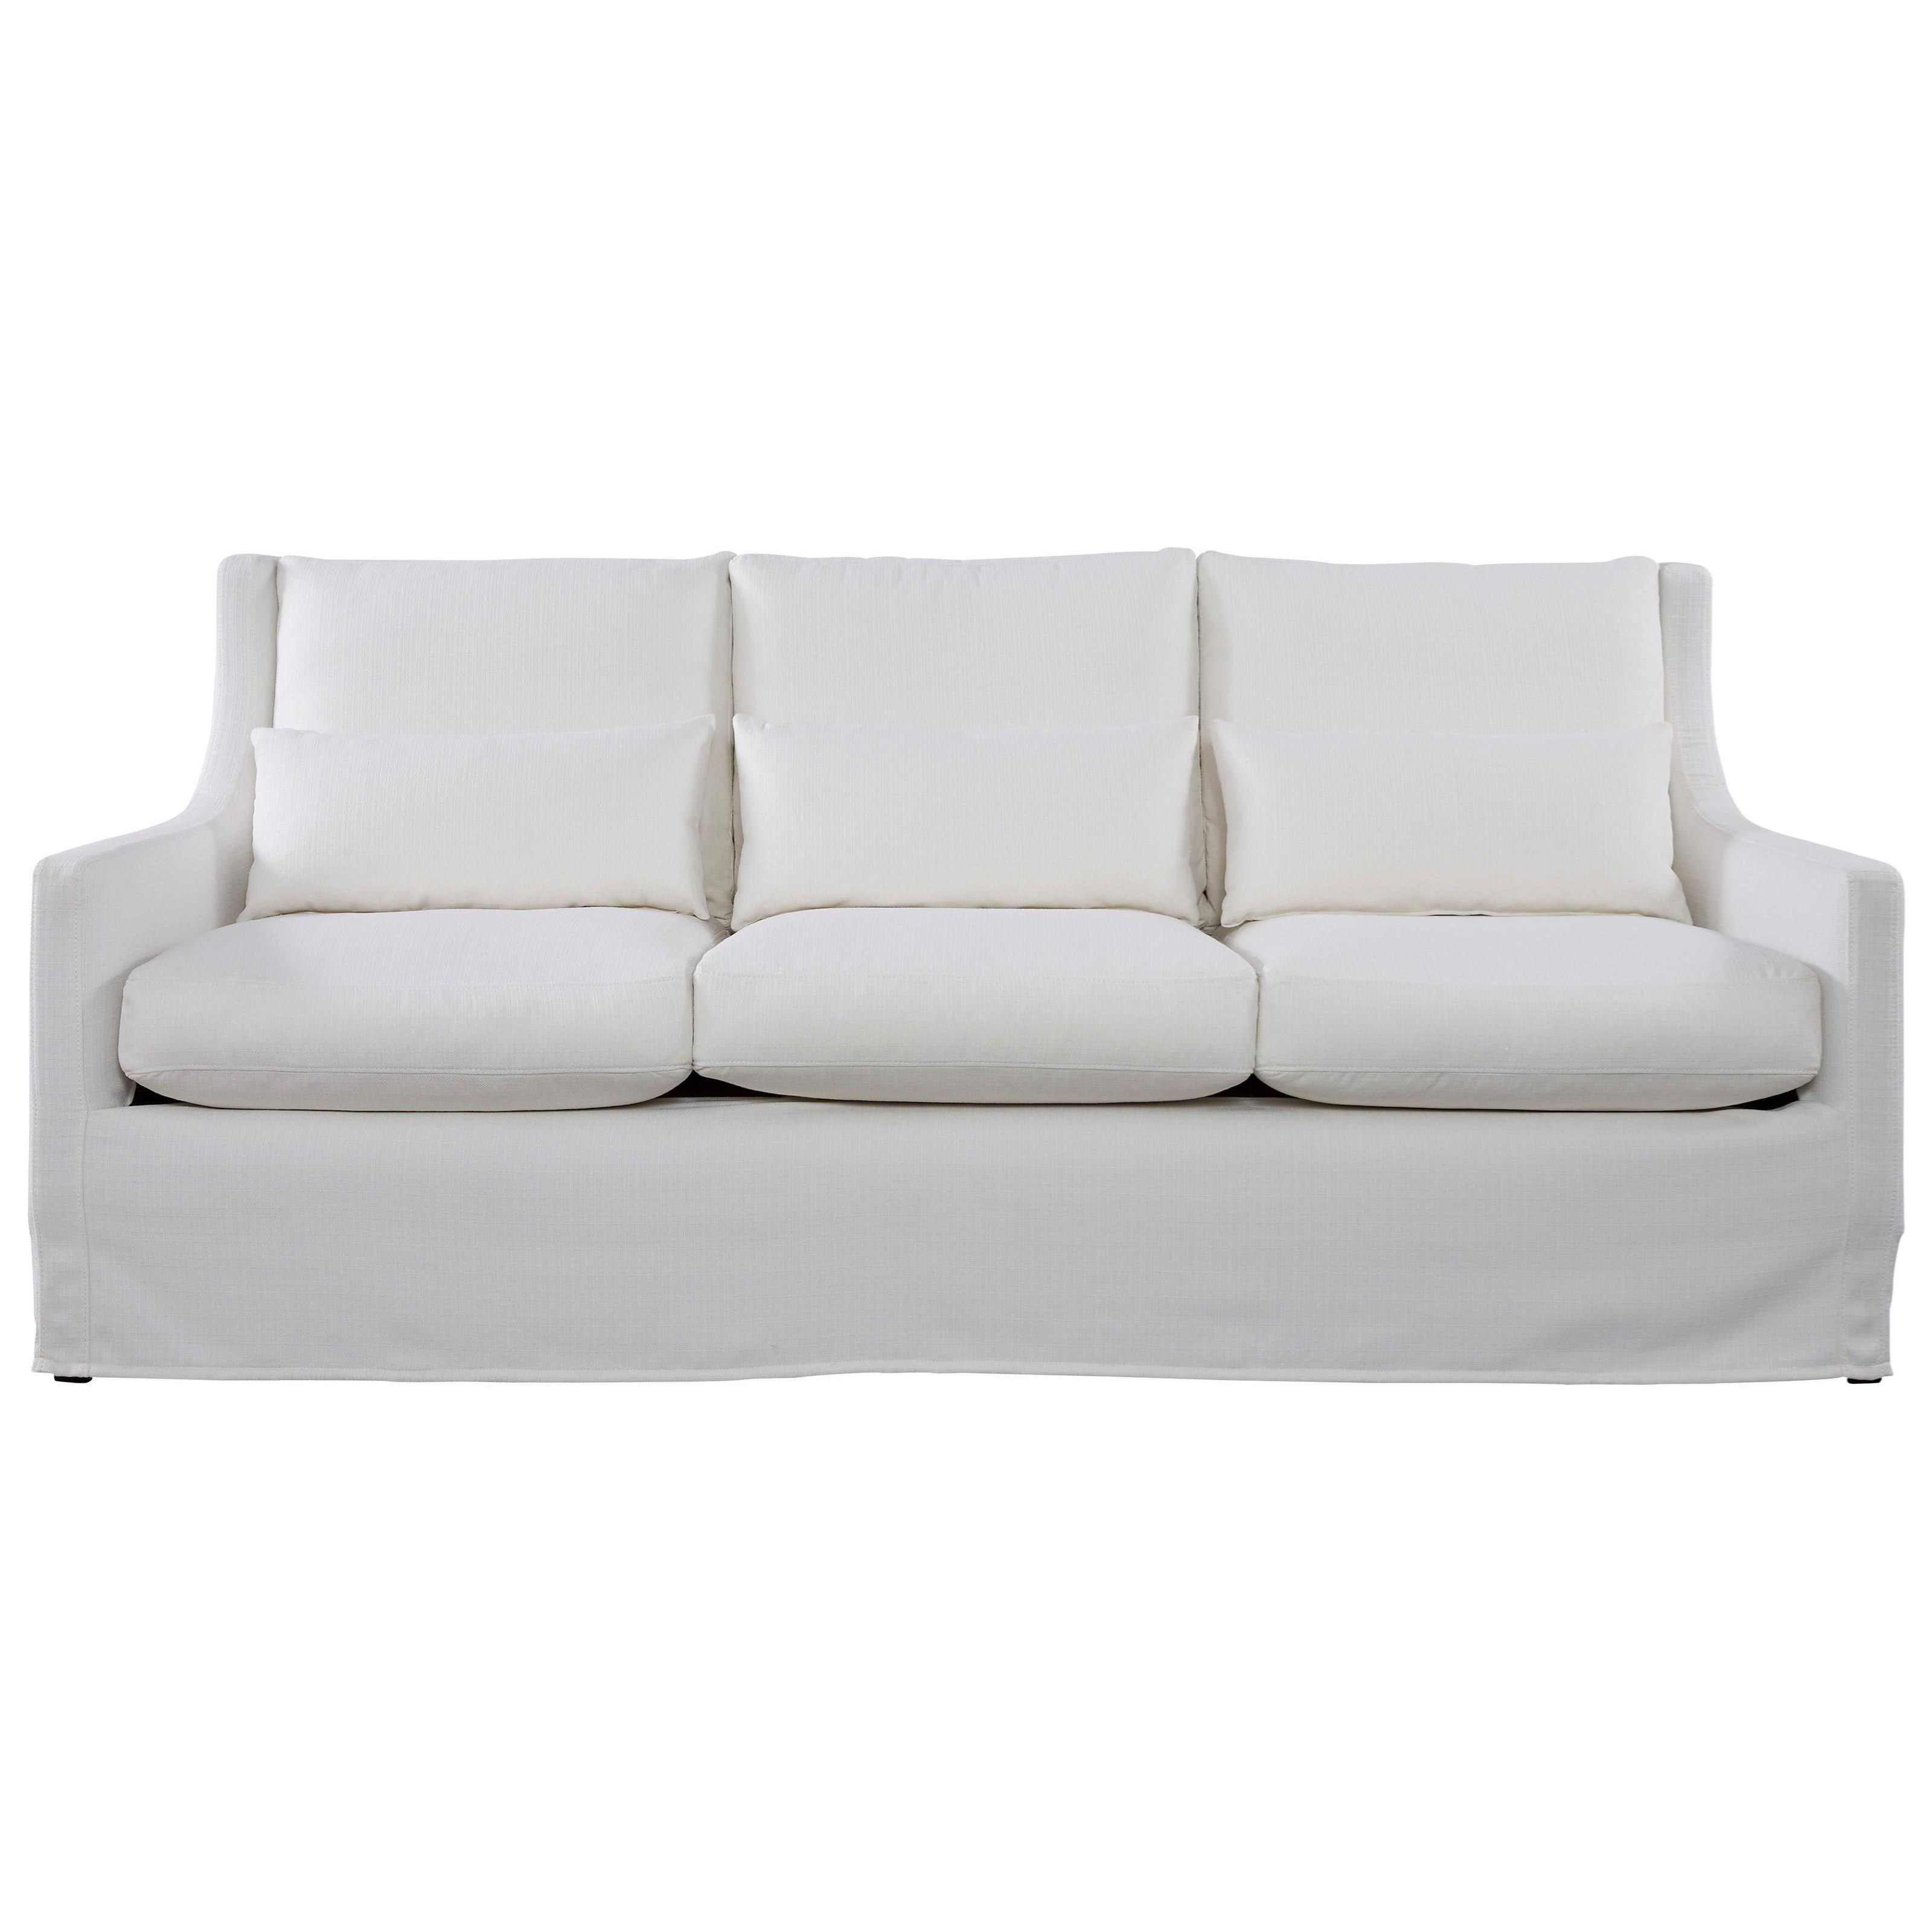 Sloane Sofa by Universal at Baer's Furniture